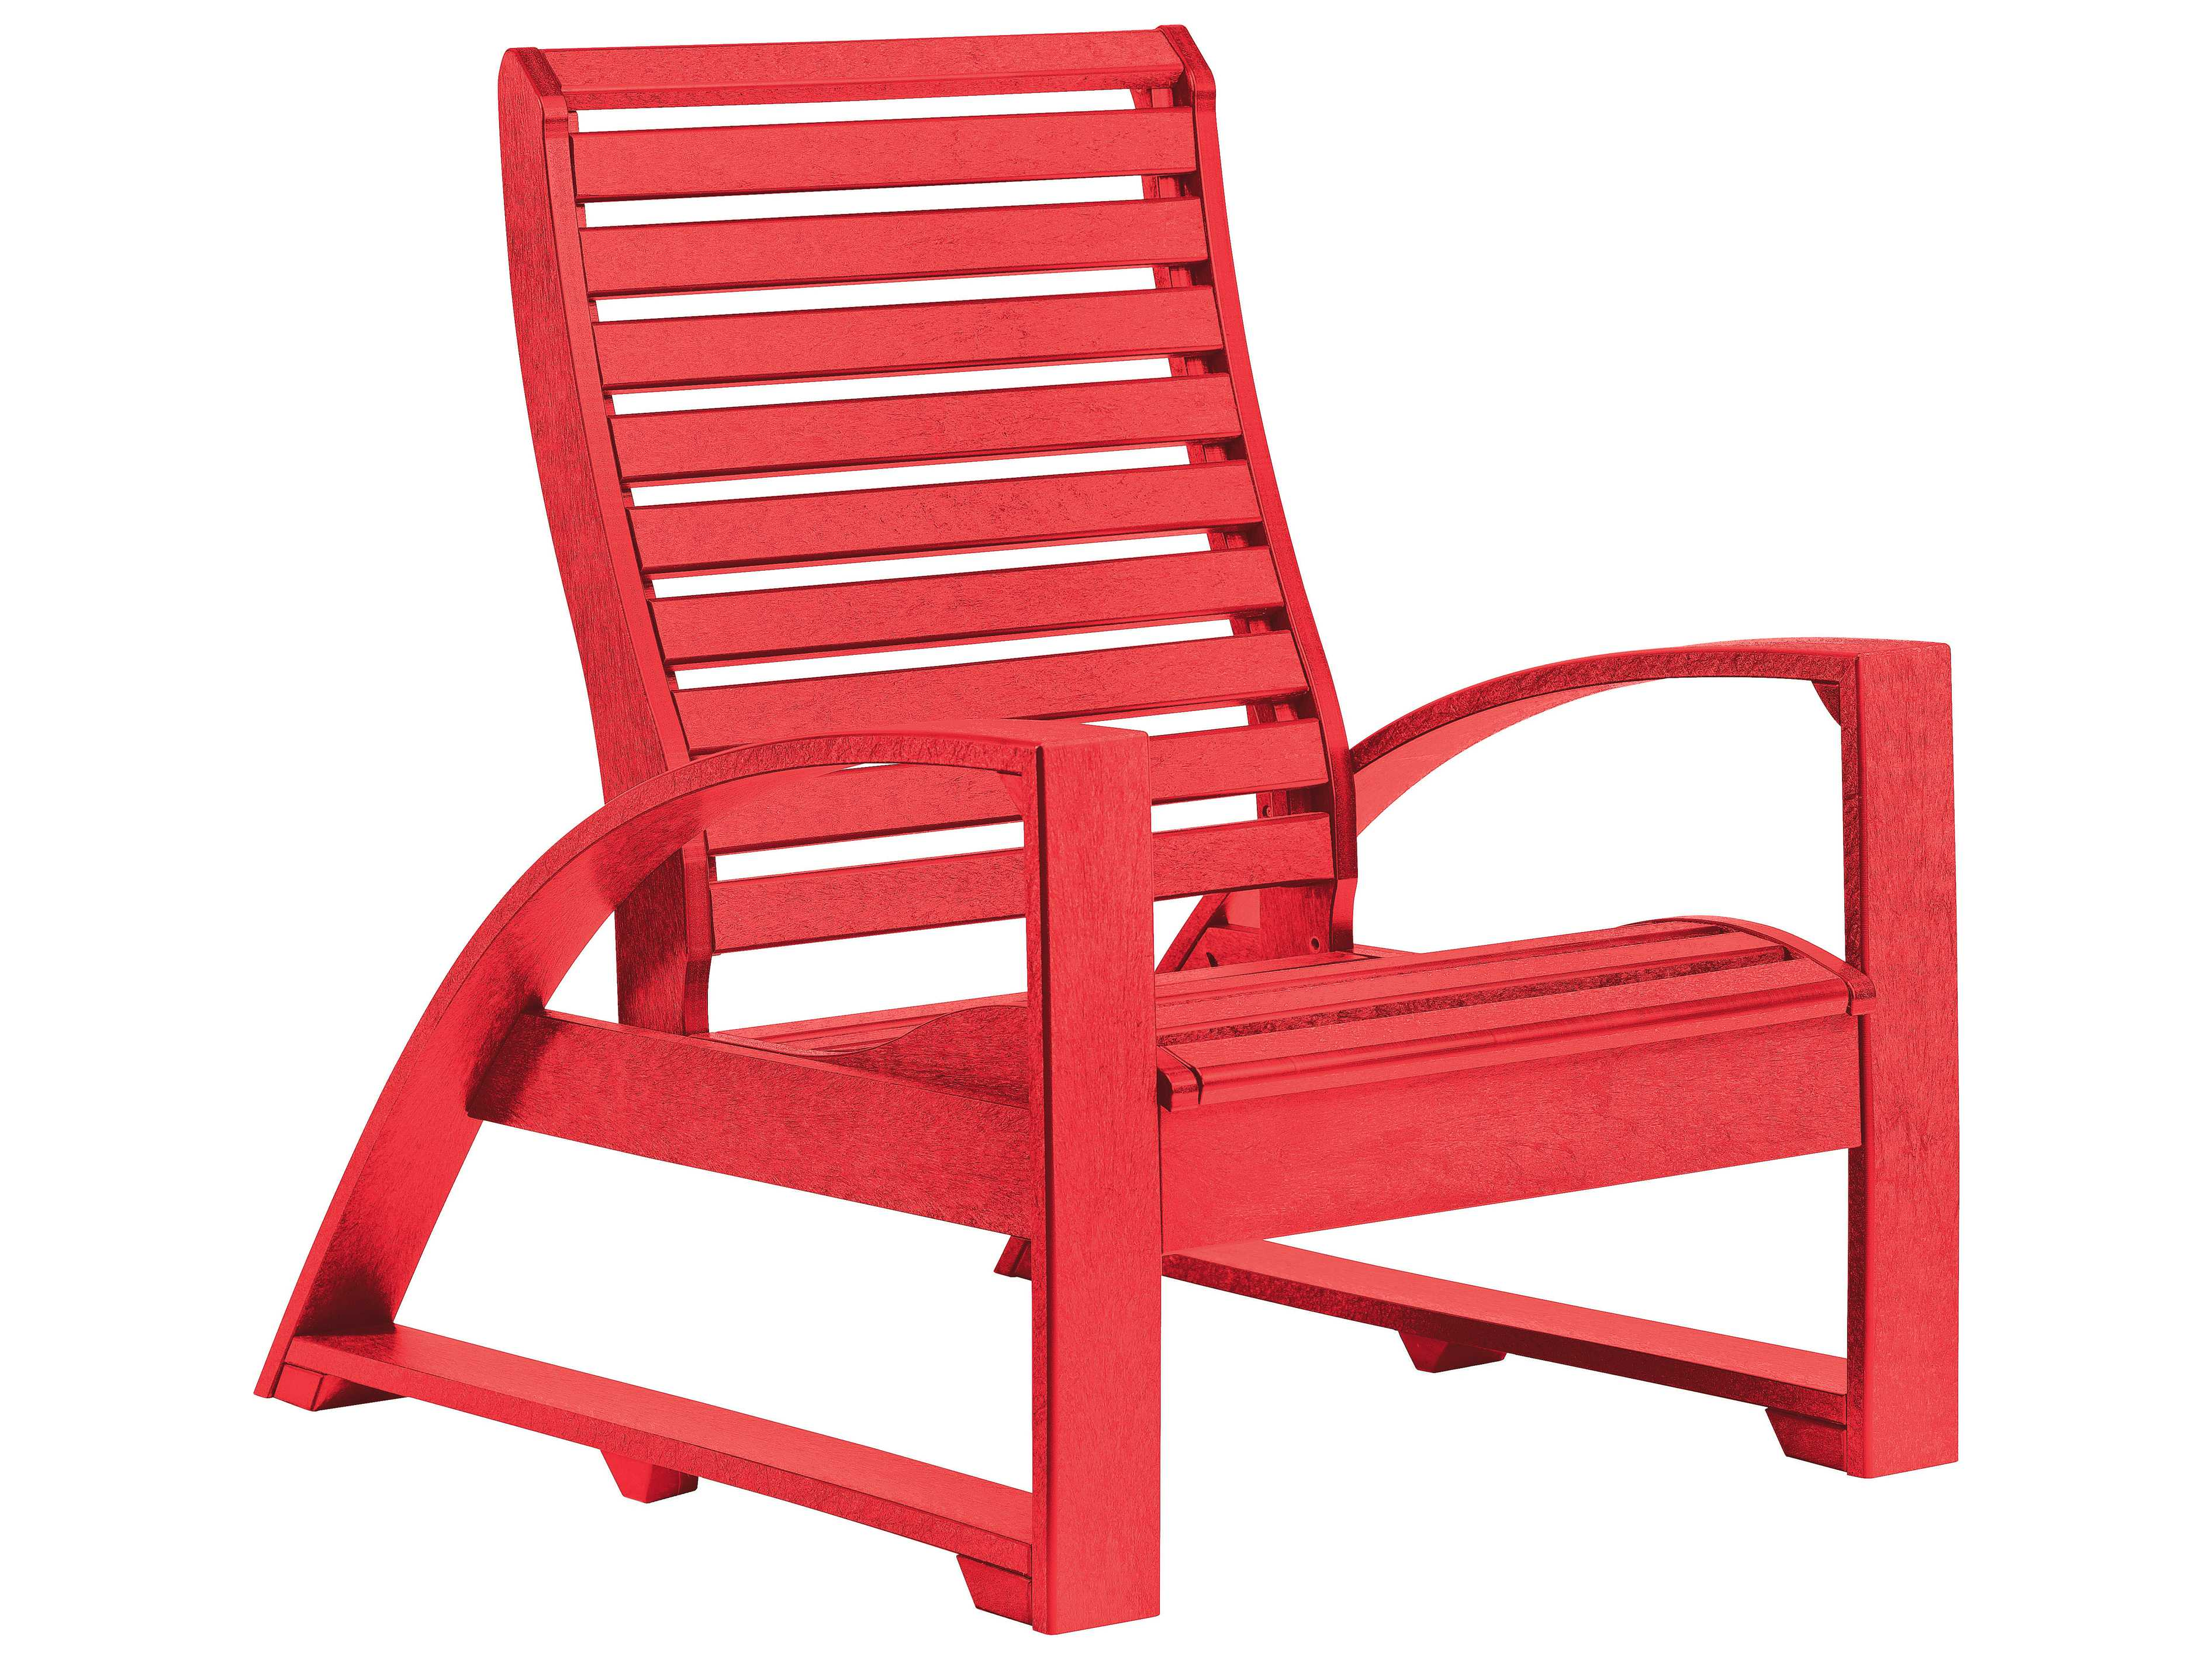 C R Plastic St Tropez Adirondack Chair